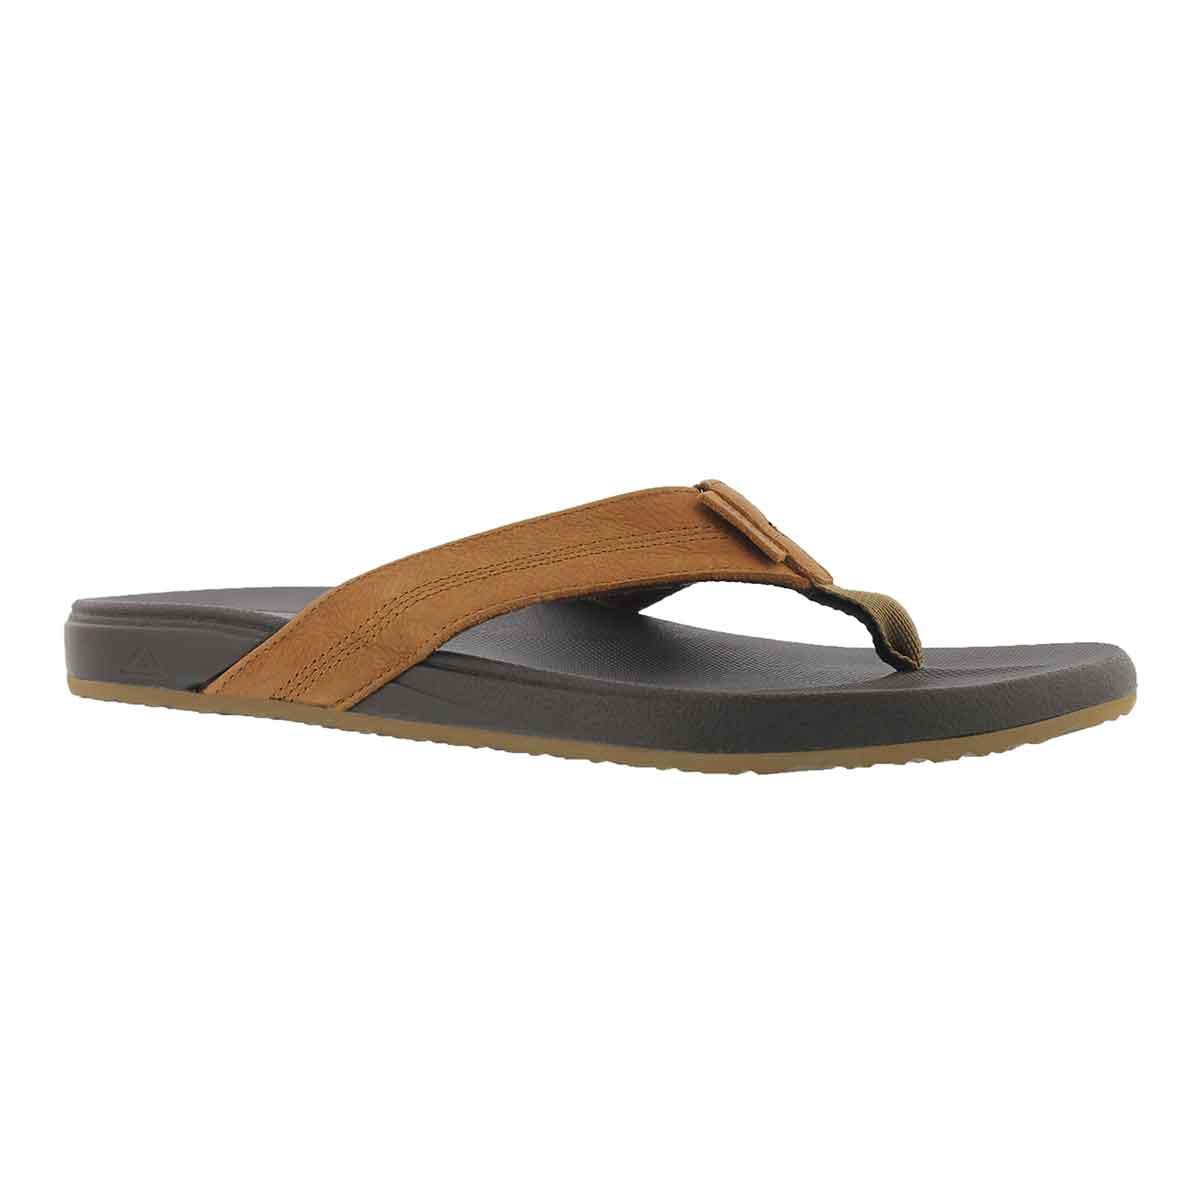 Men's CUSHION BOUNCE PHANTOM LE brown sandal